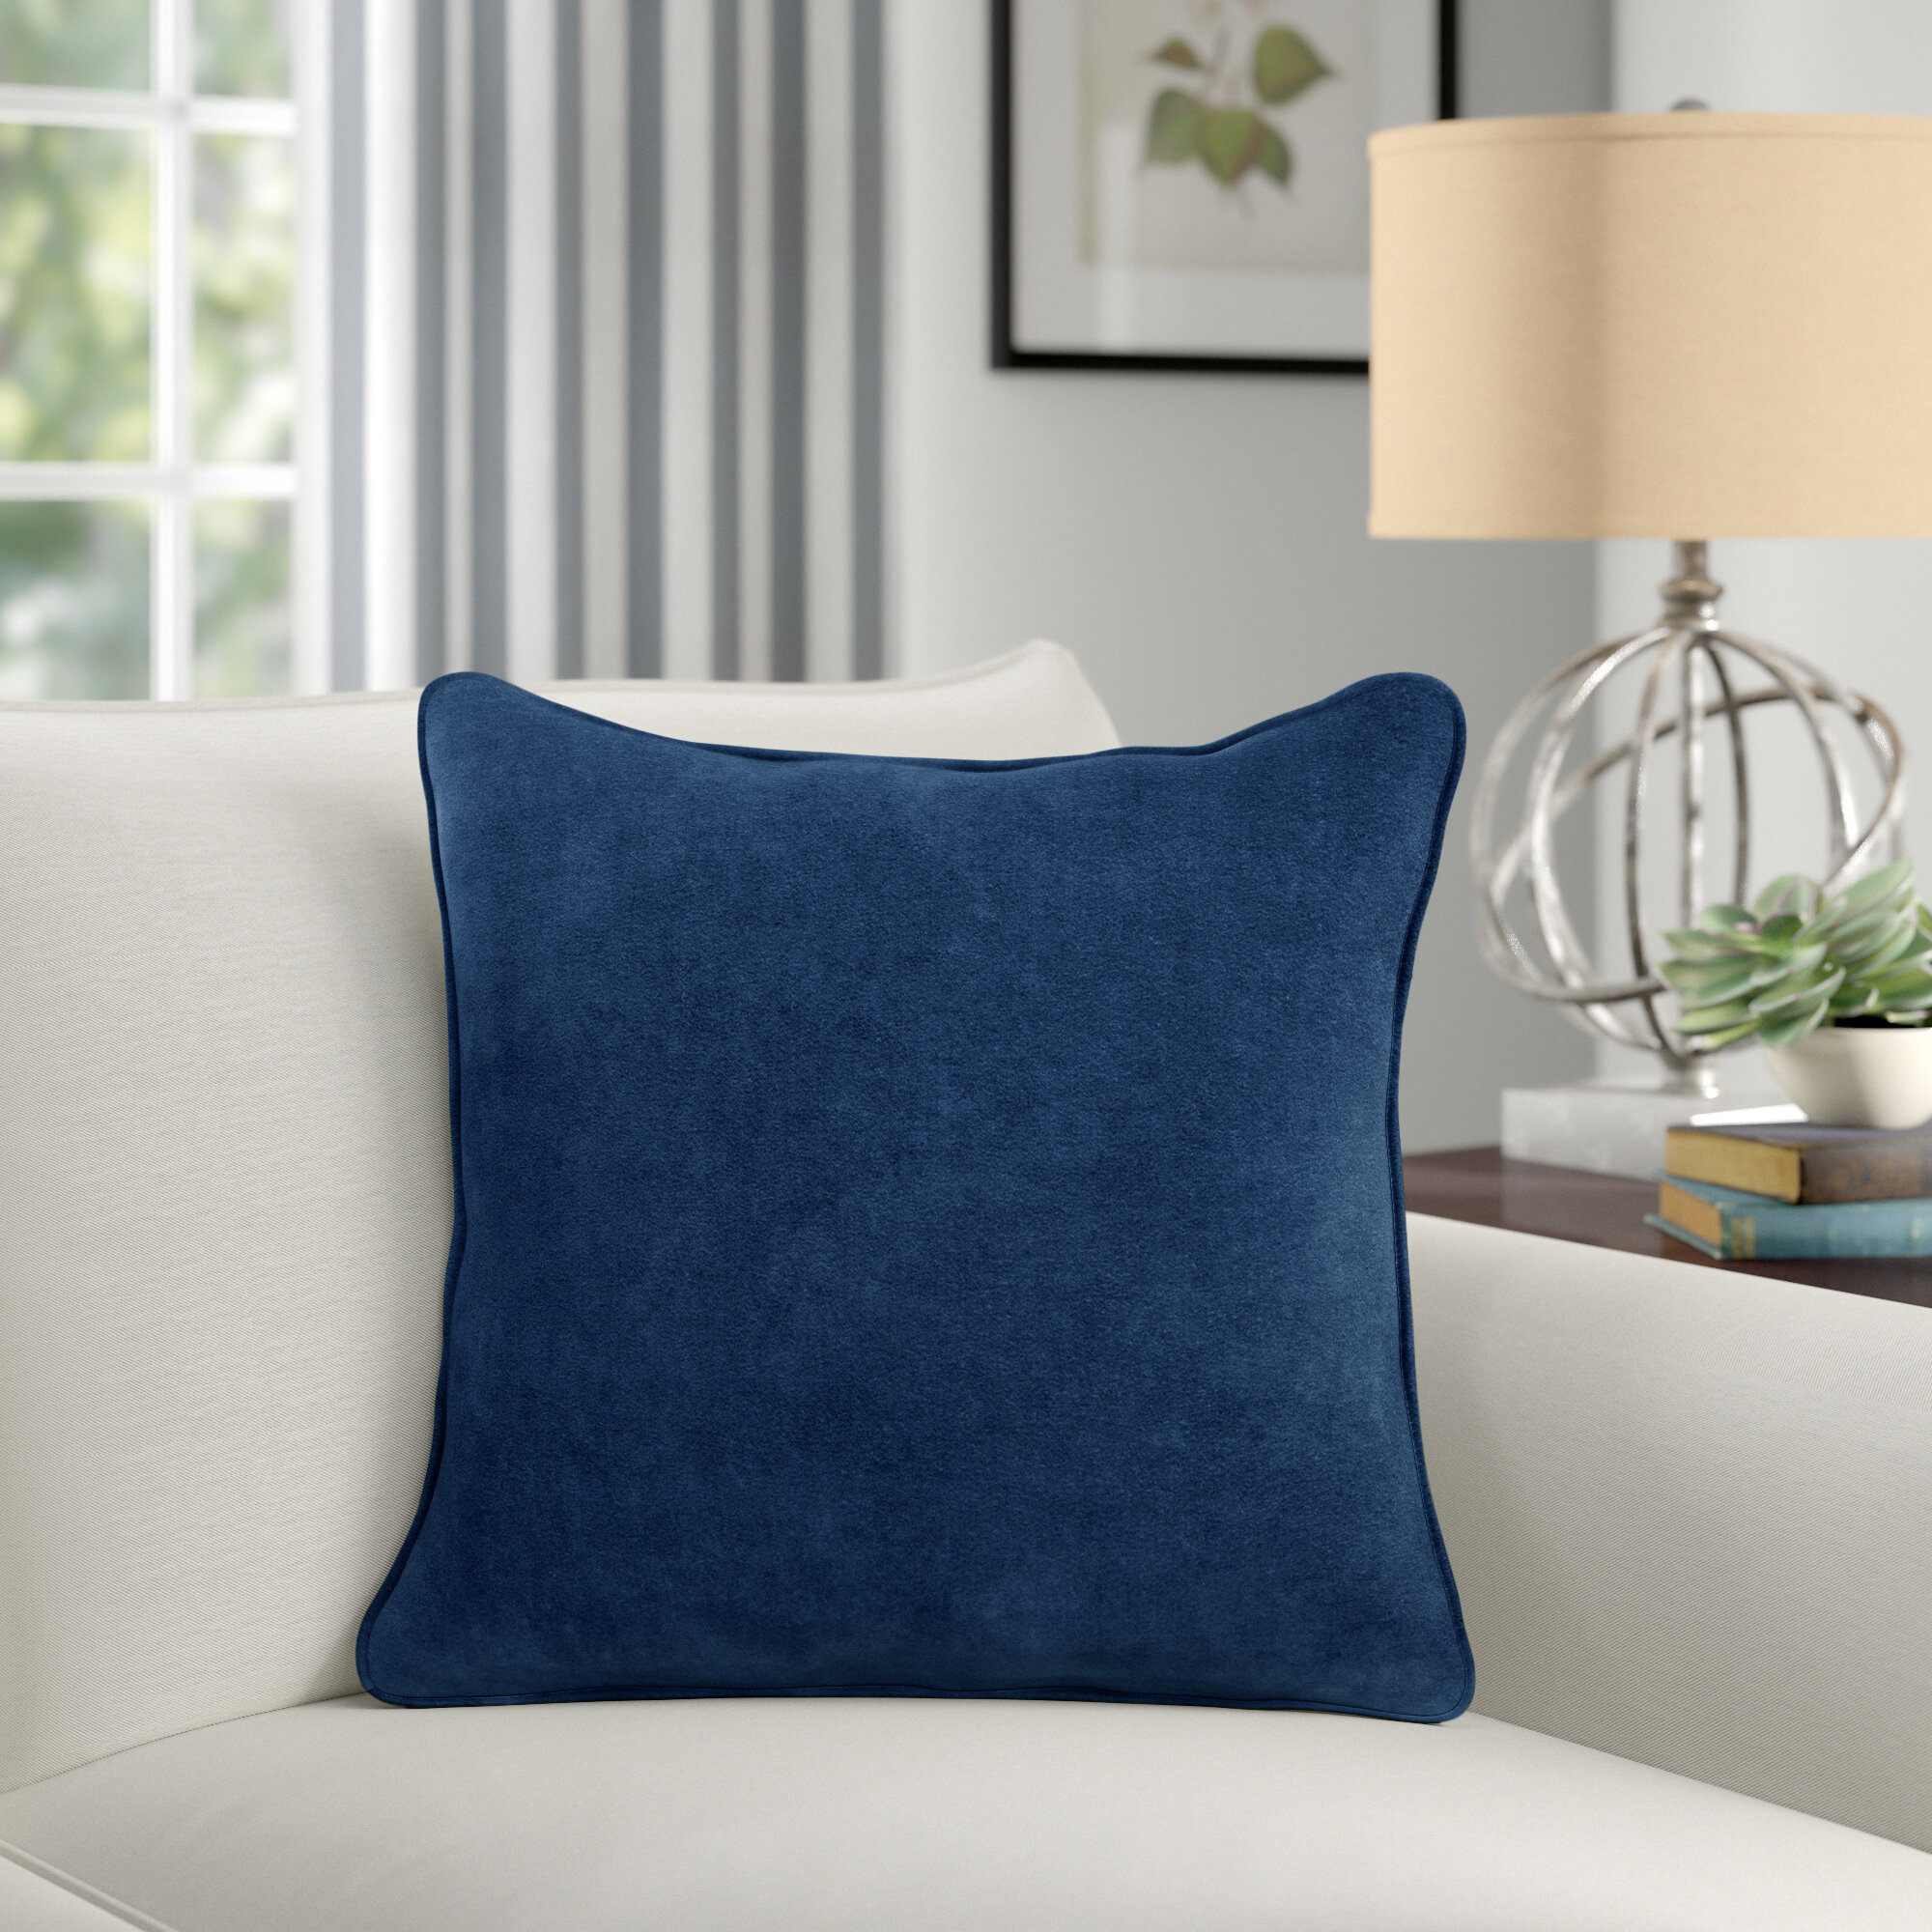 Birch Lane Neppie Square Cotton Pillow Cover Reviews Wayfair